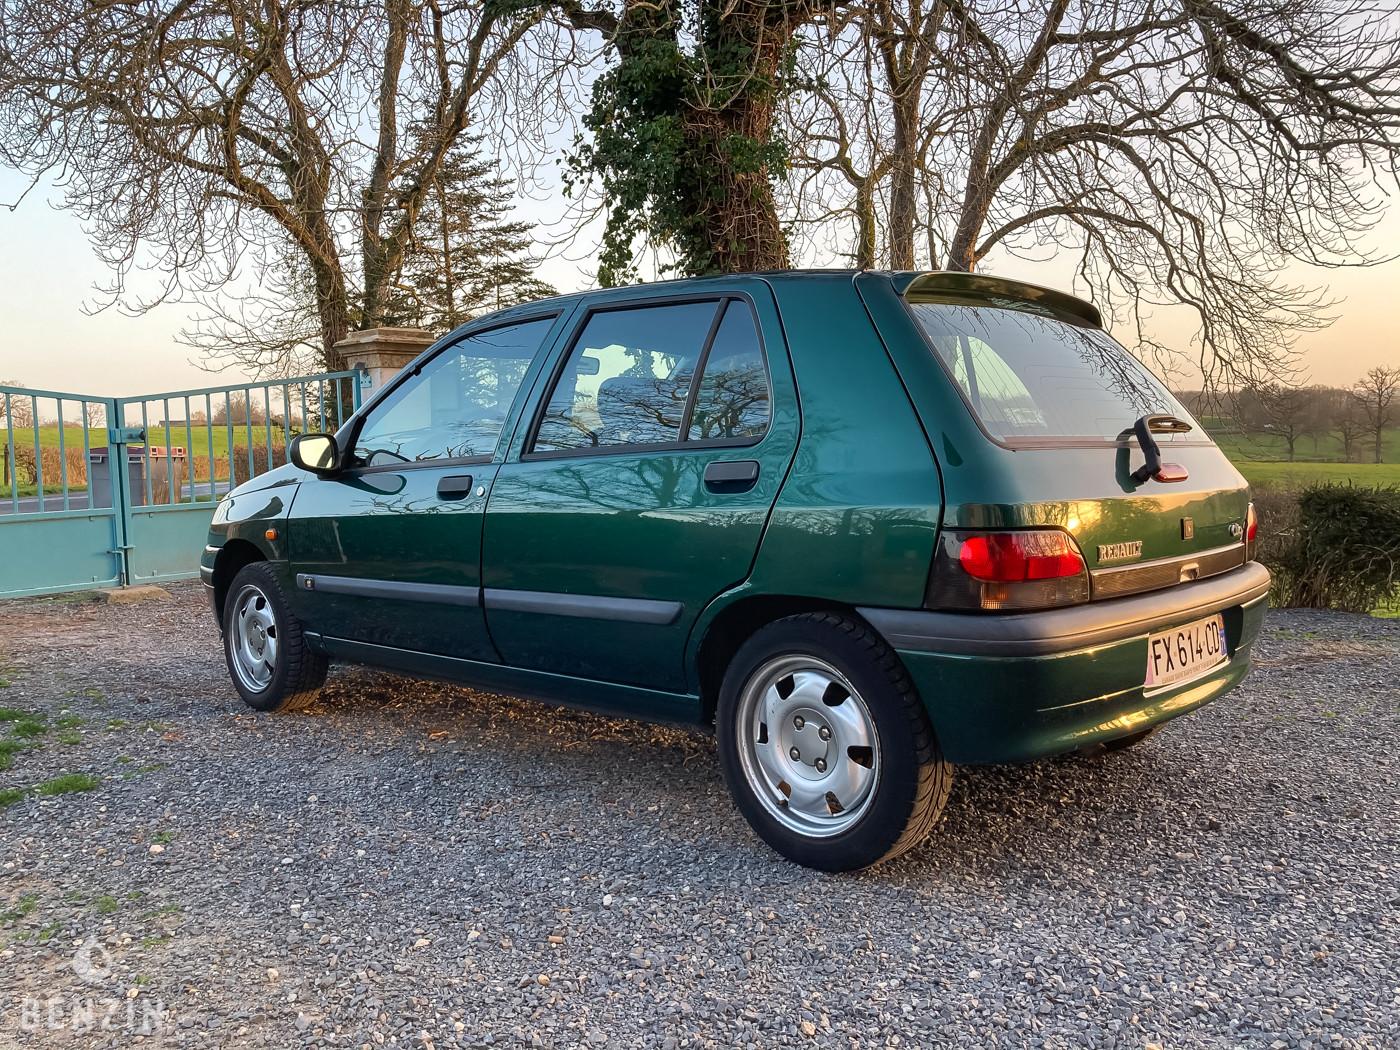 Renault Clio Apple occasion à vendre se vende ocasion zu verkaufen for sale